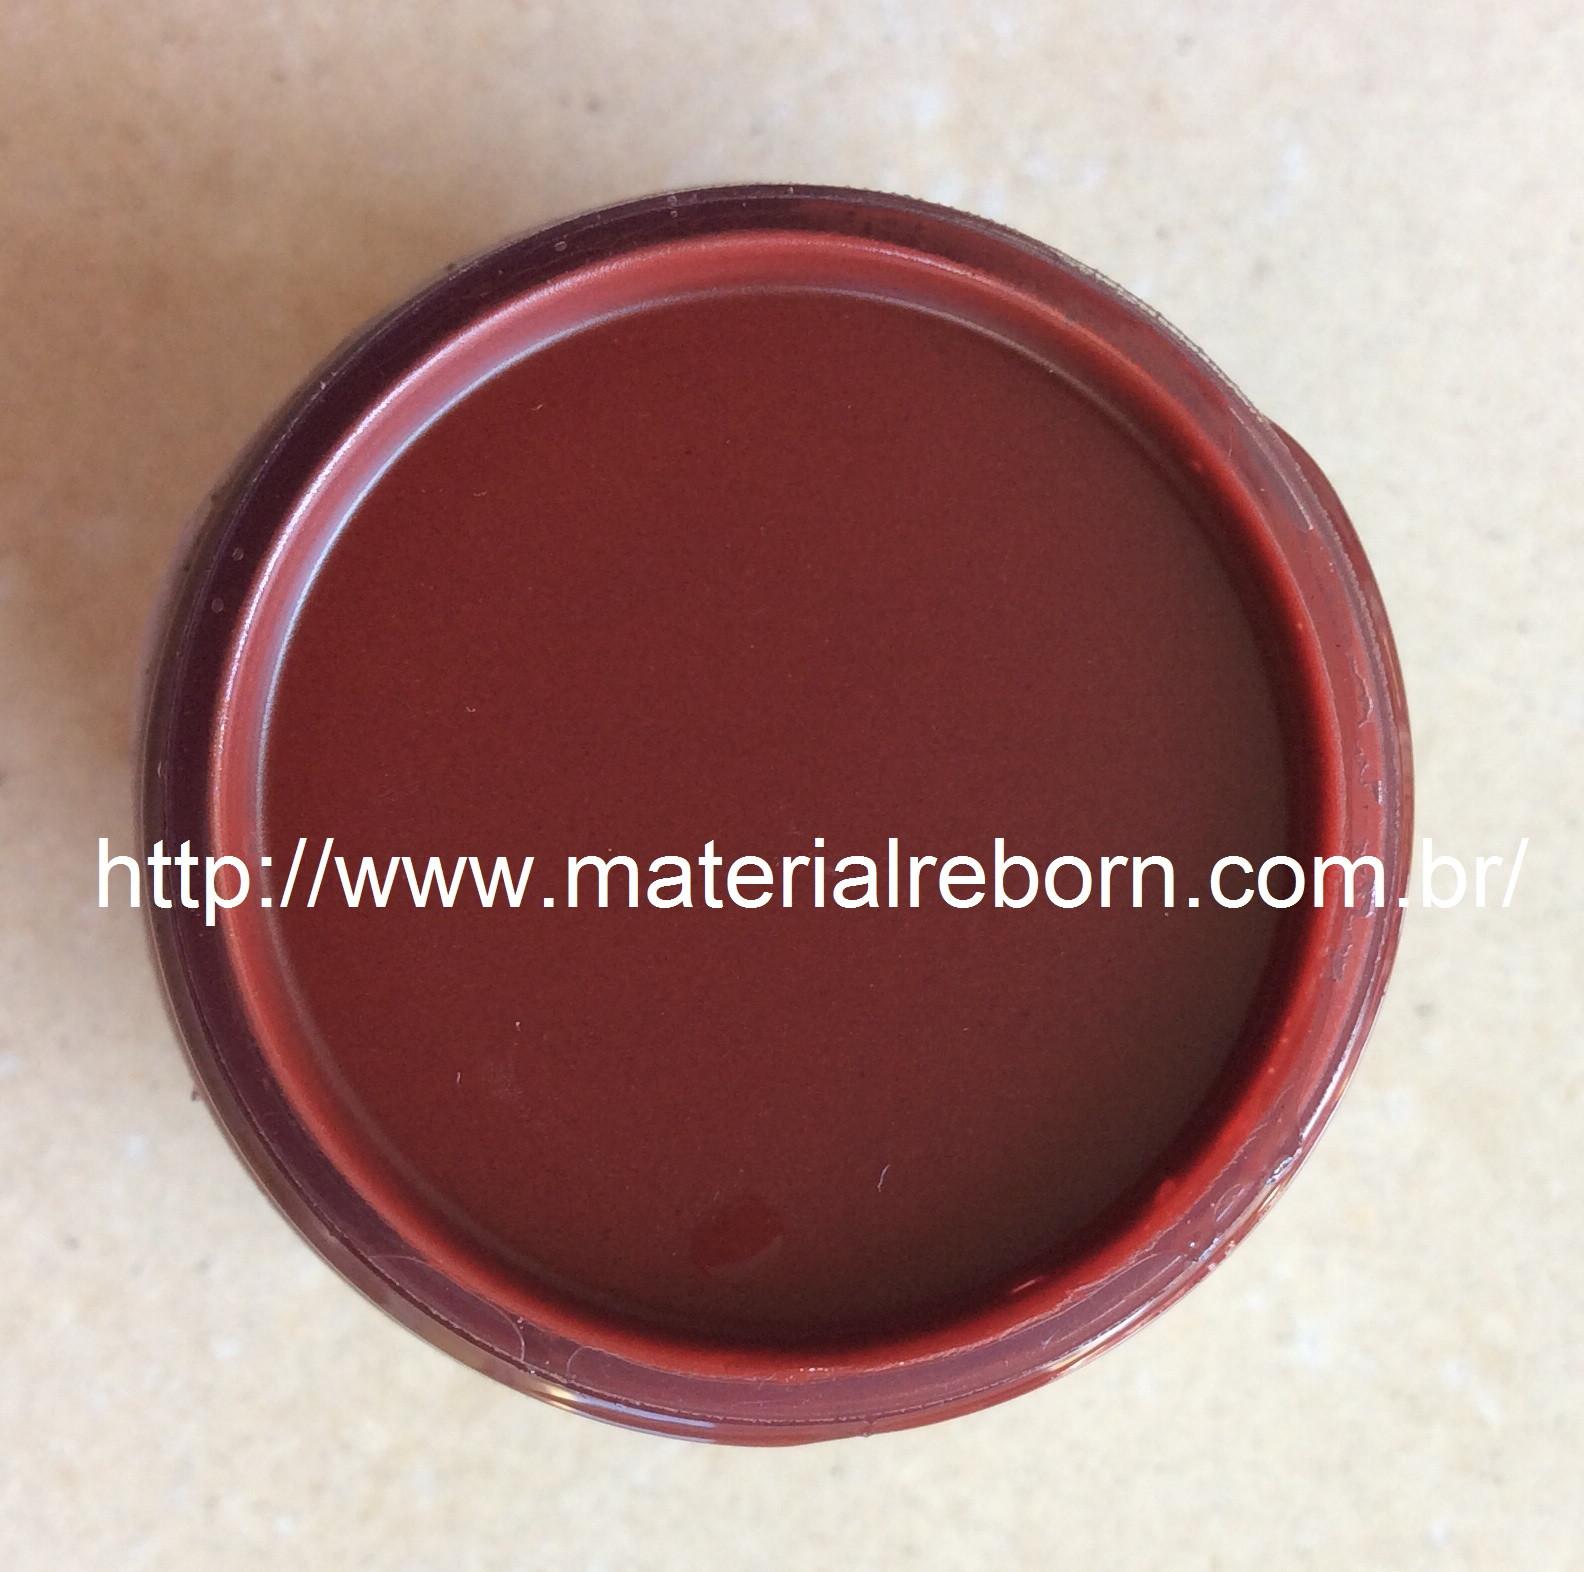 Tinta Sweet Heart Lips  ( 4 ou 8 gramas) PROMOÇÃO